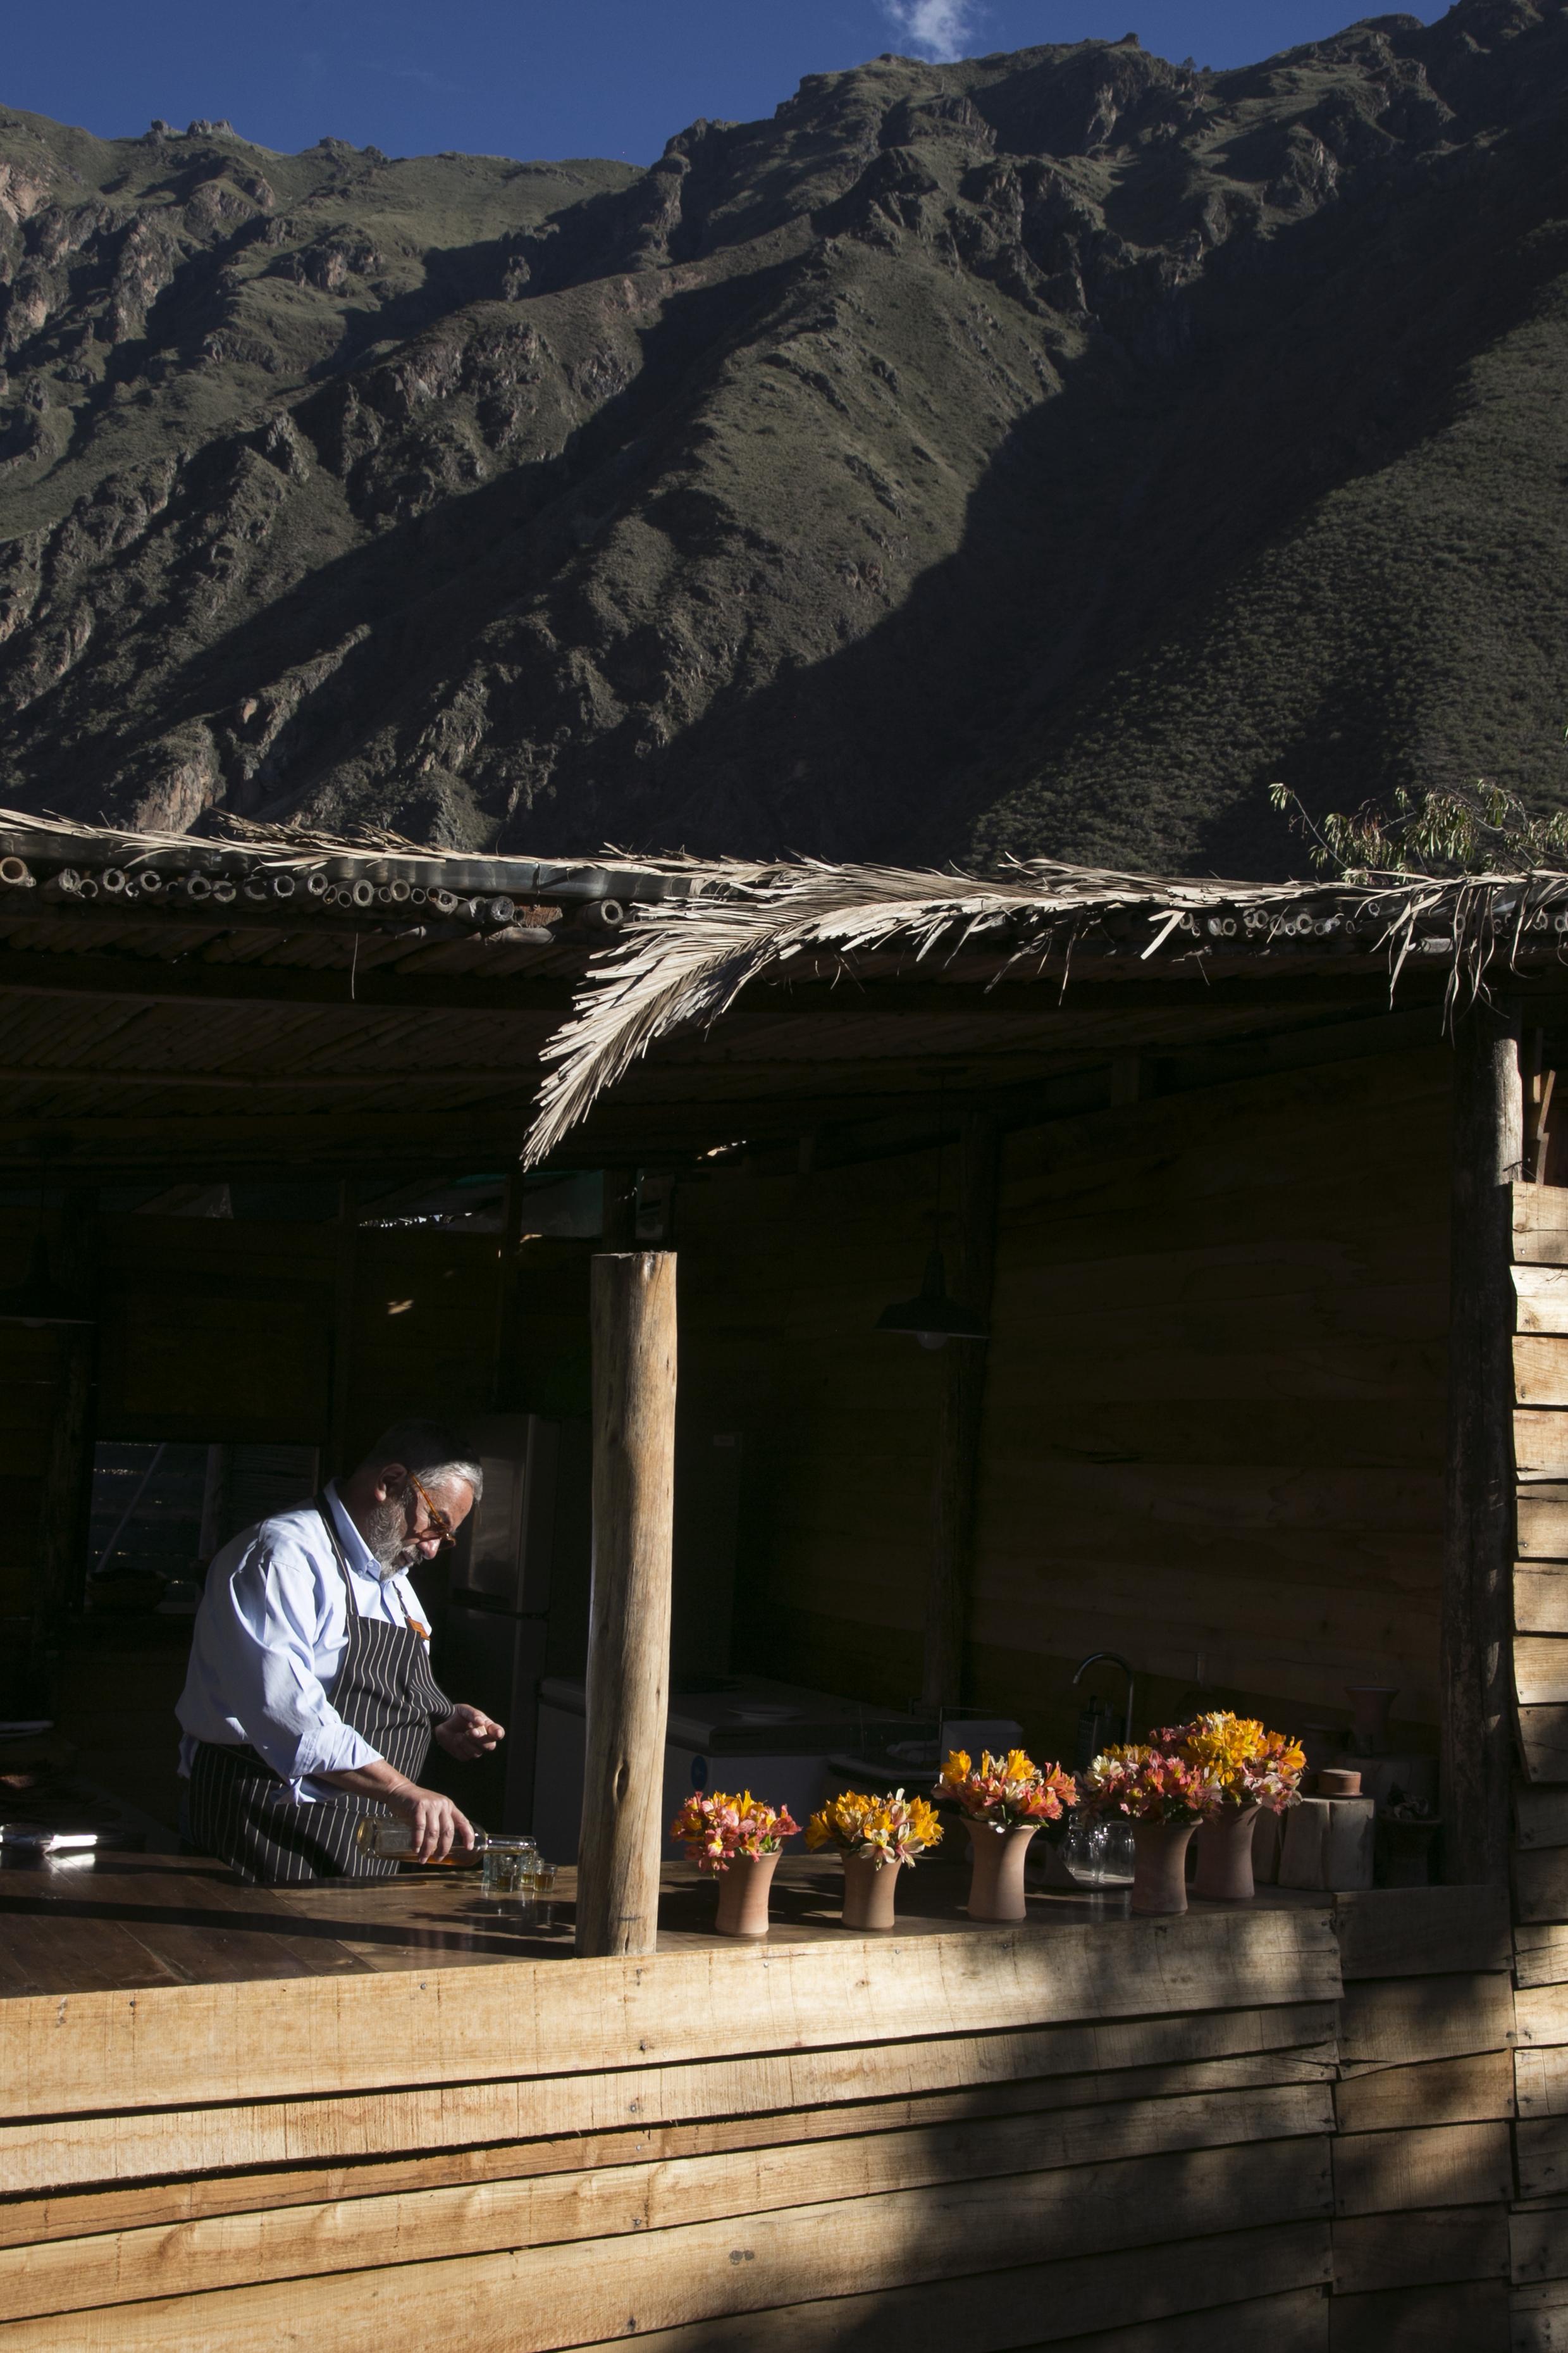 Gabriel Velasquez serves a pachamanca lunch in the organic garden at El Aubergue in Ollantaytambo, Peru.